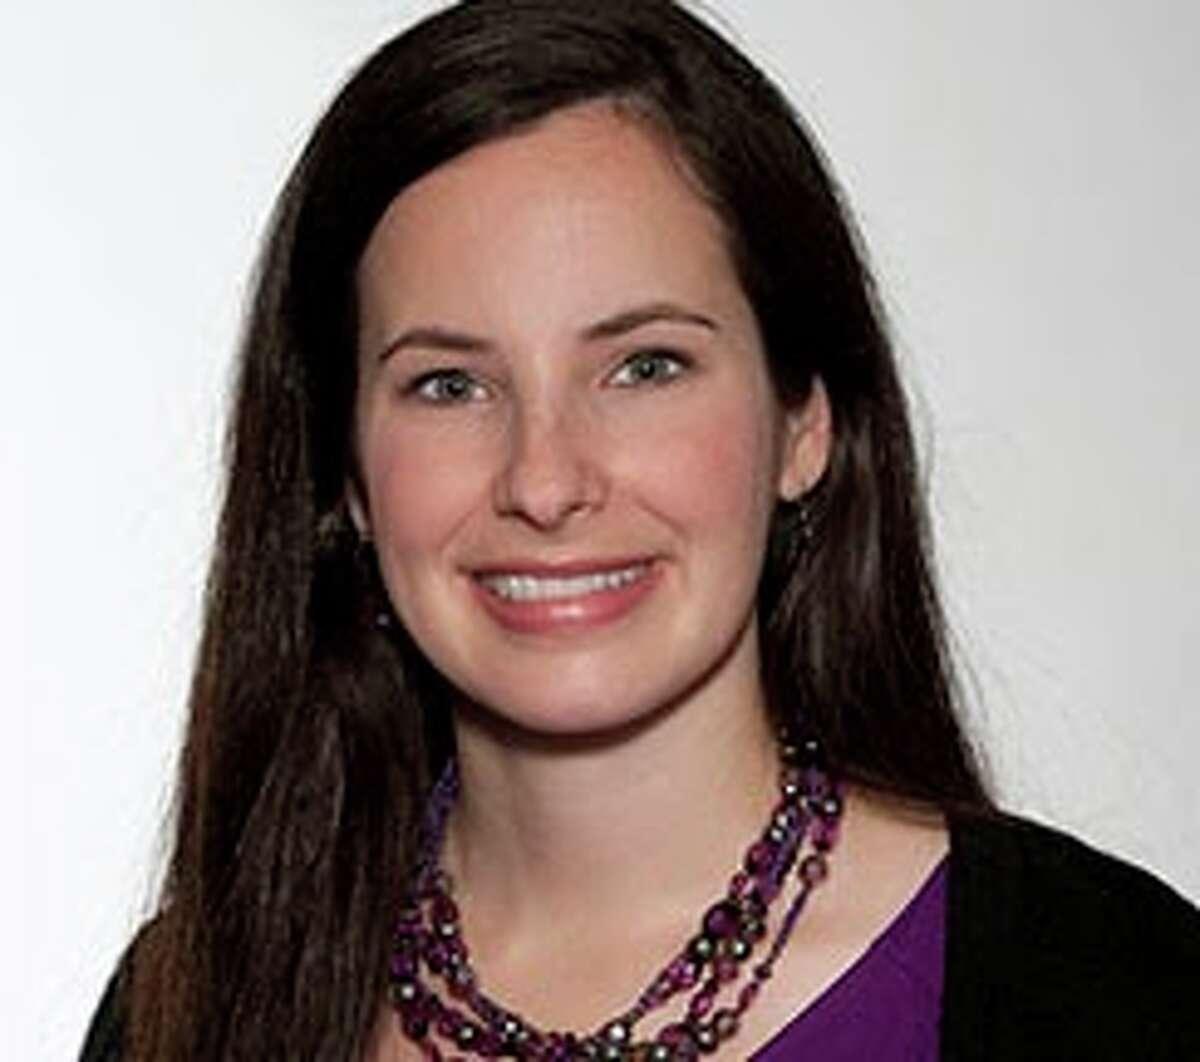 Ashley England received her alternative teacher certification from LeTourneau University.